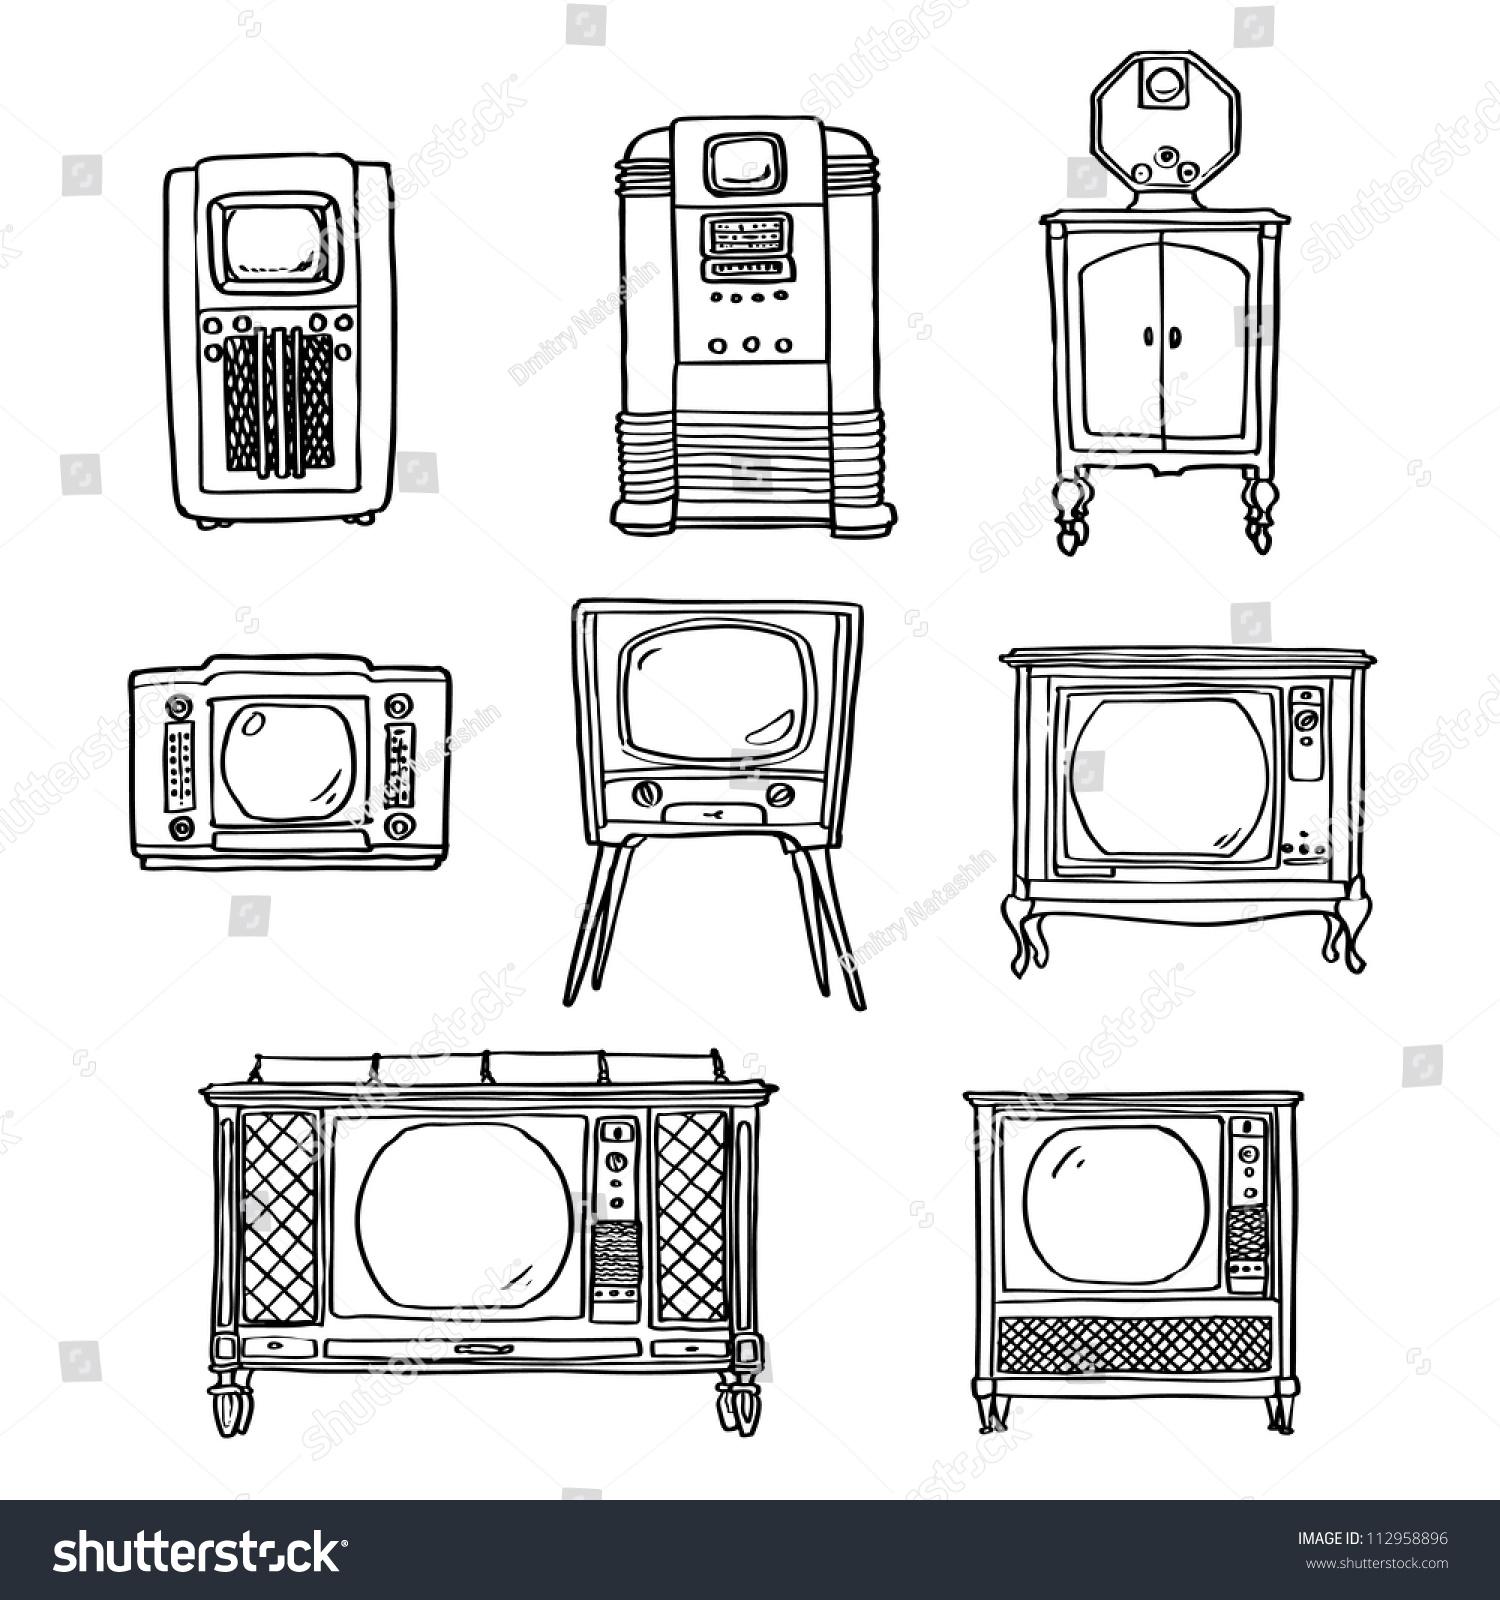 Vintage Tv Set Hand Drawn Illustration Stock Vector